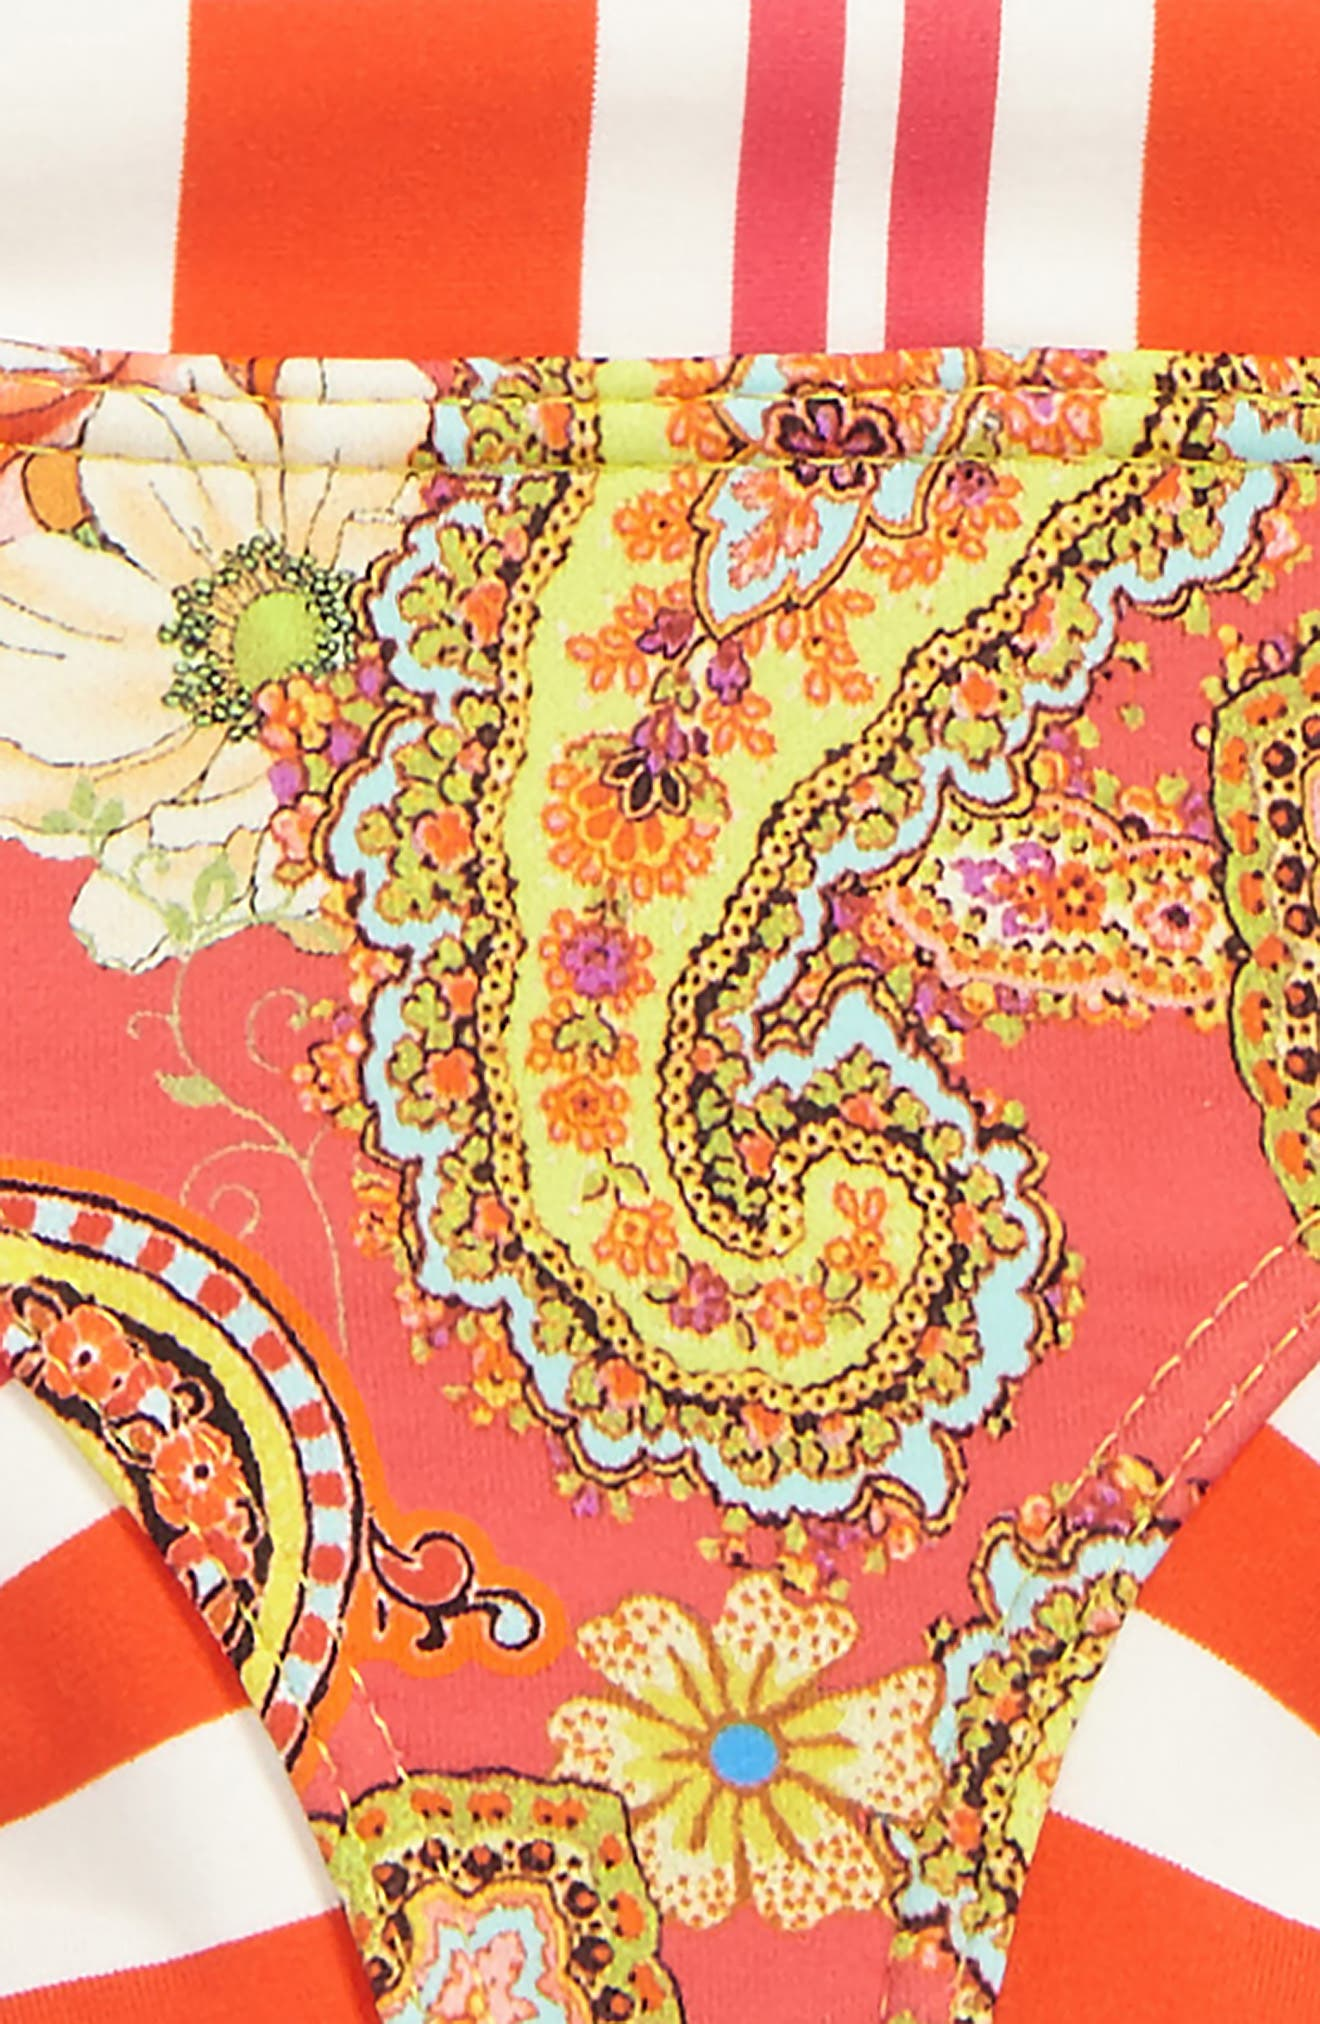 Camellia Two-Piece Swimsuit,                             Alternate thumbnail 2, color,                             600